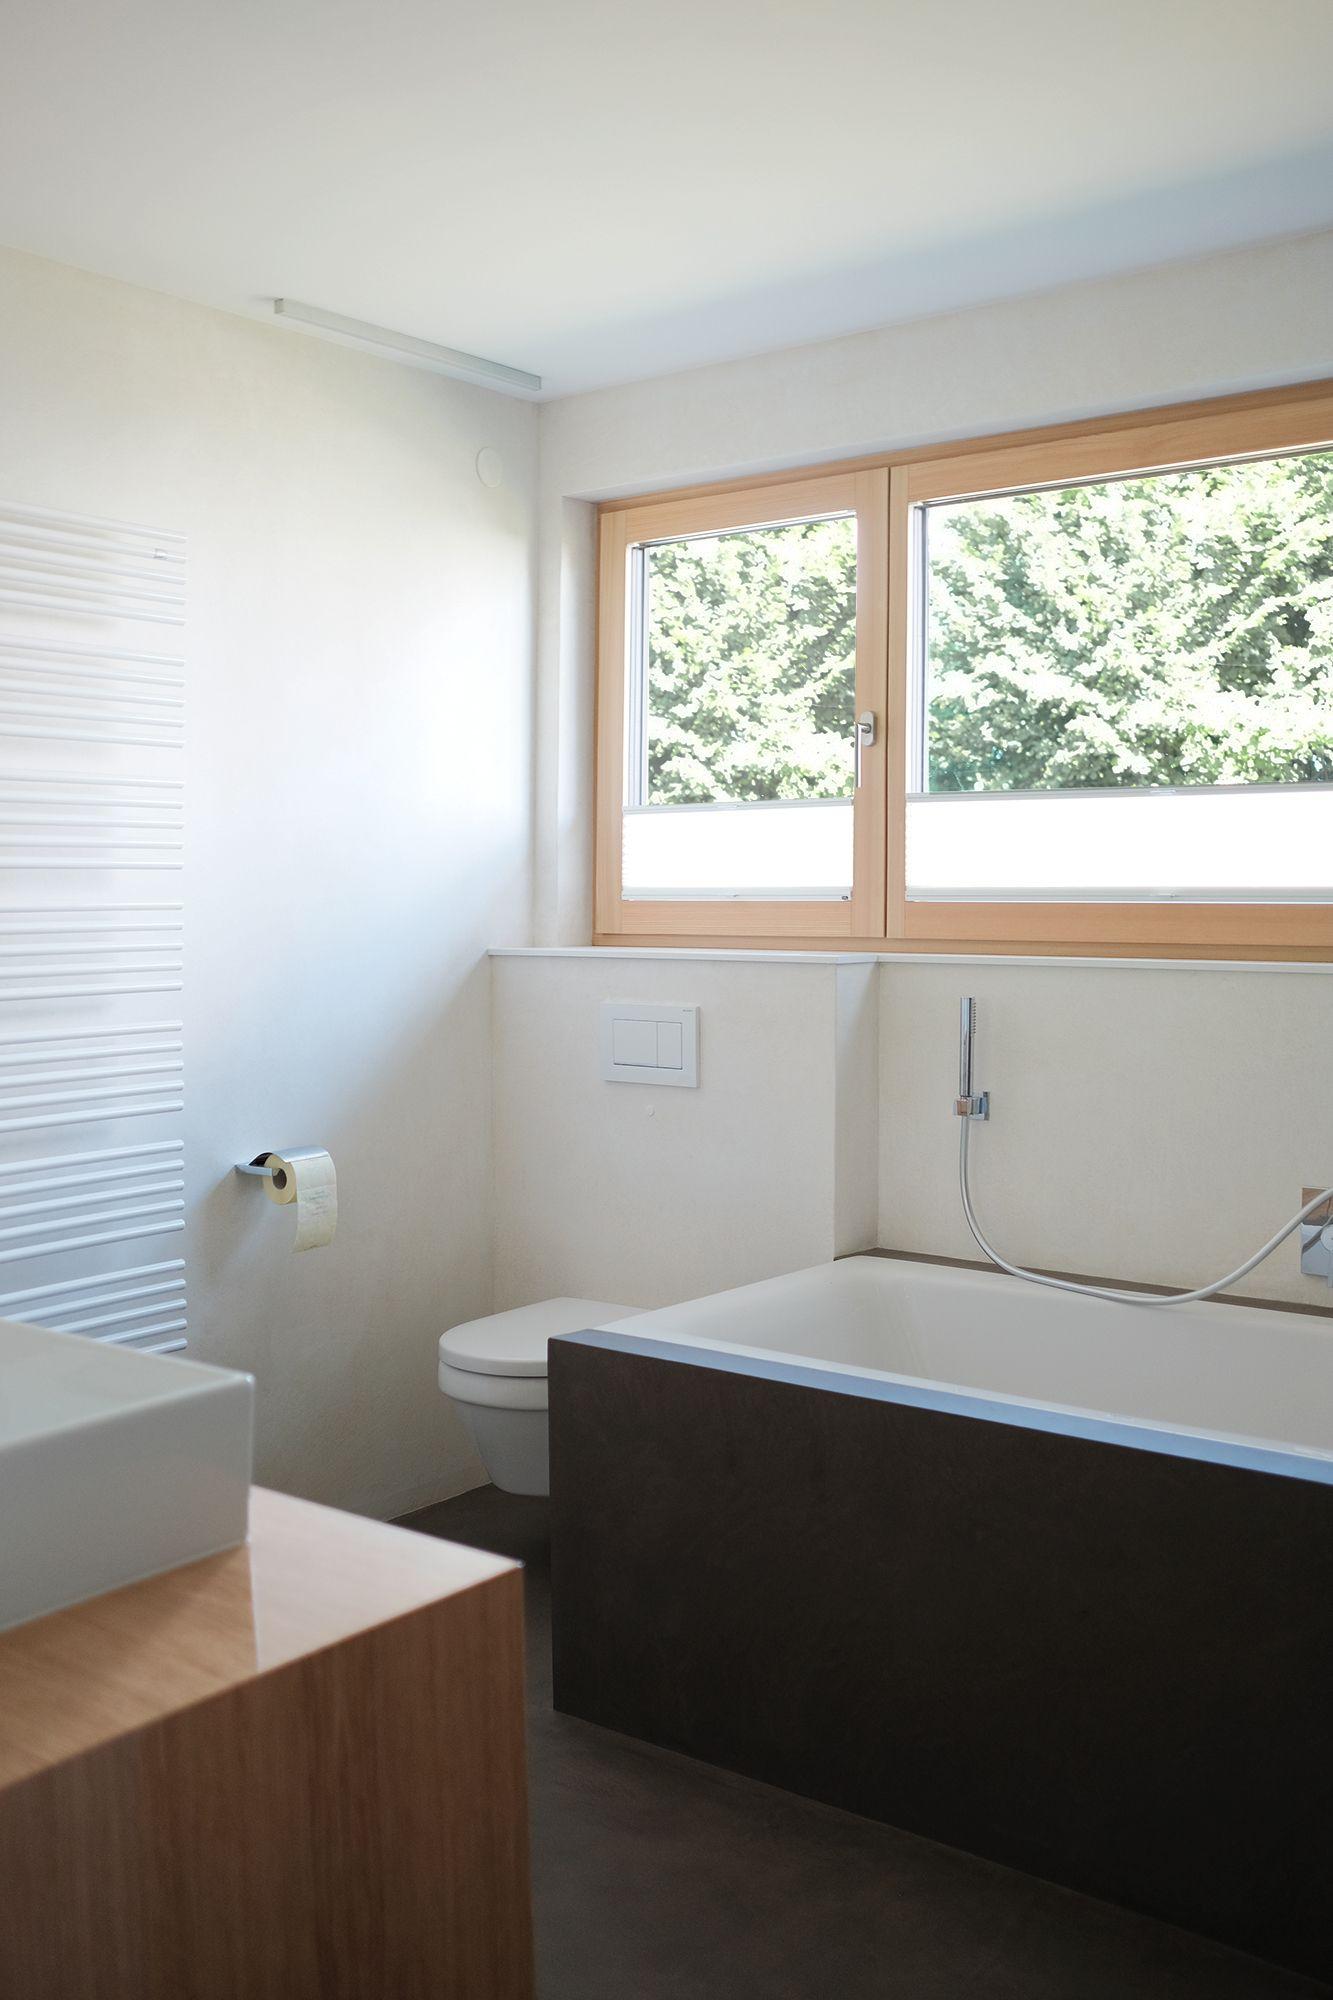 Badezimmer Gespachtelt Hygienisch Praktisch Modern En 2020 Salle De Bain Bains Salle